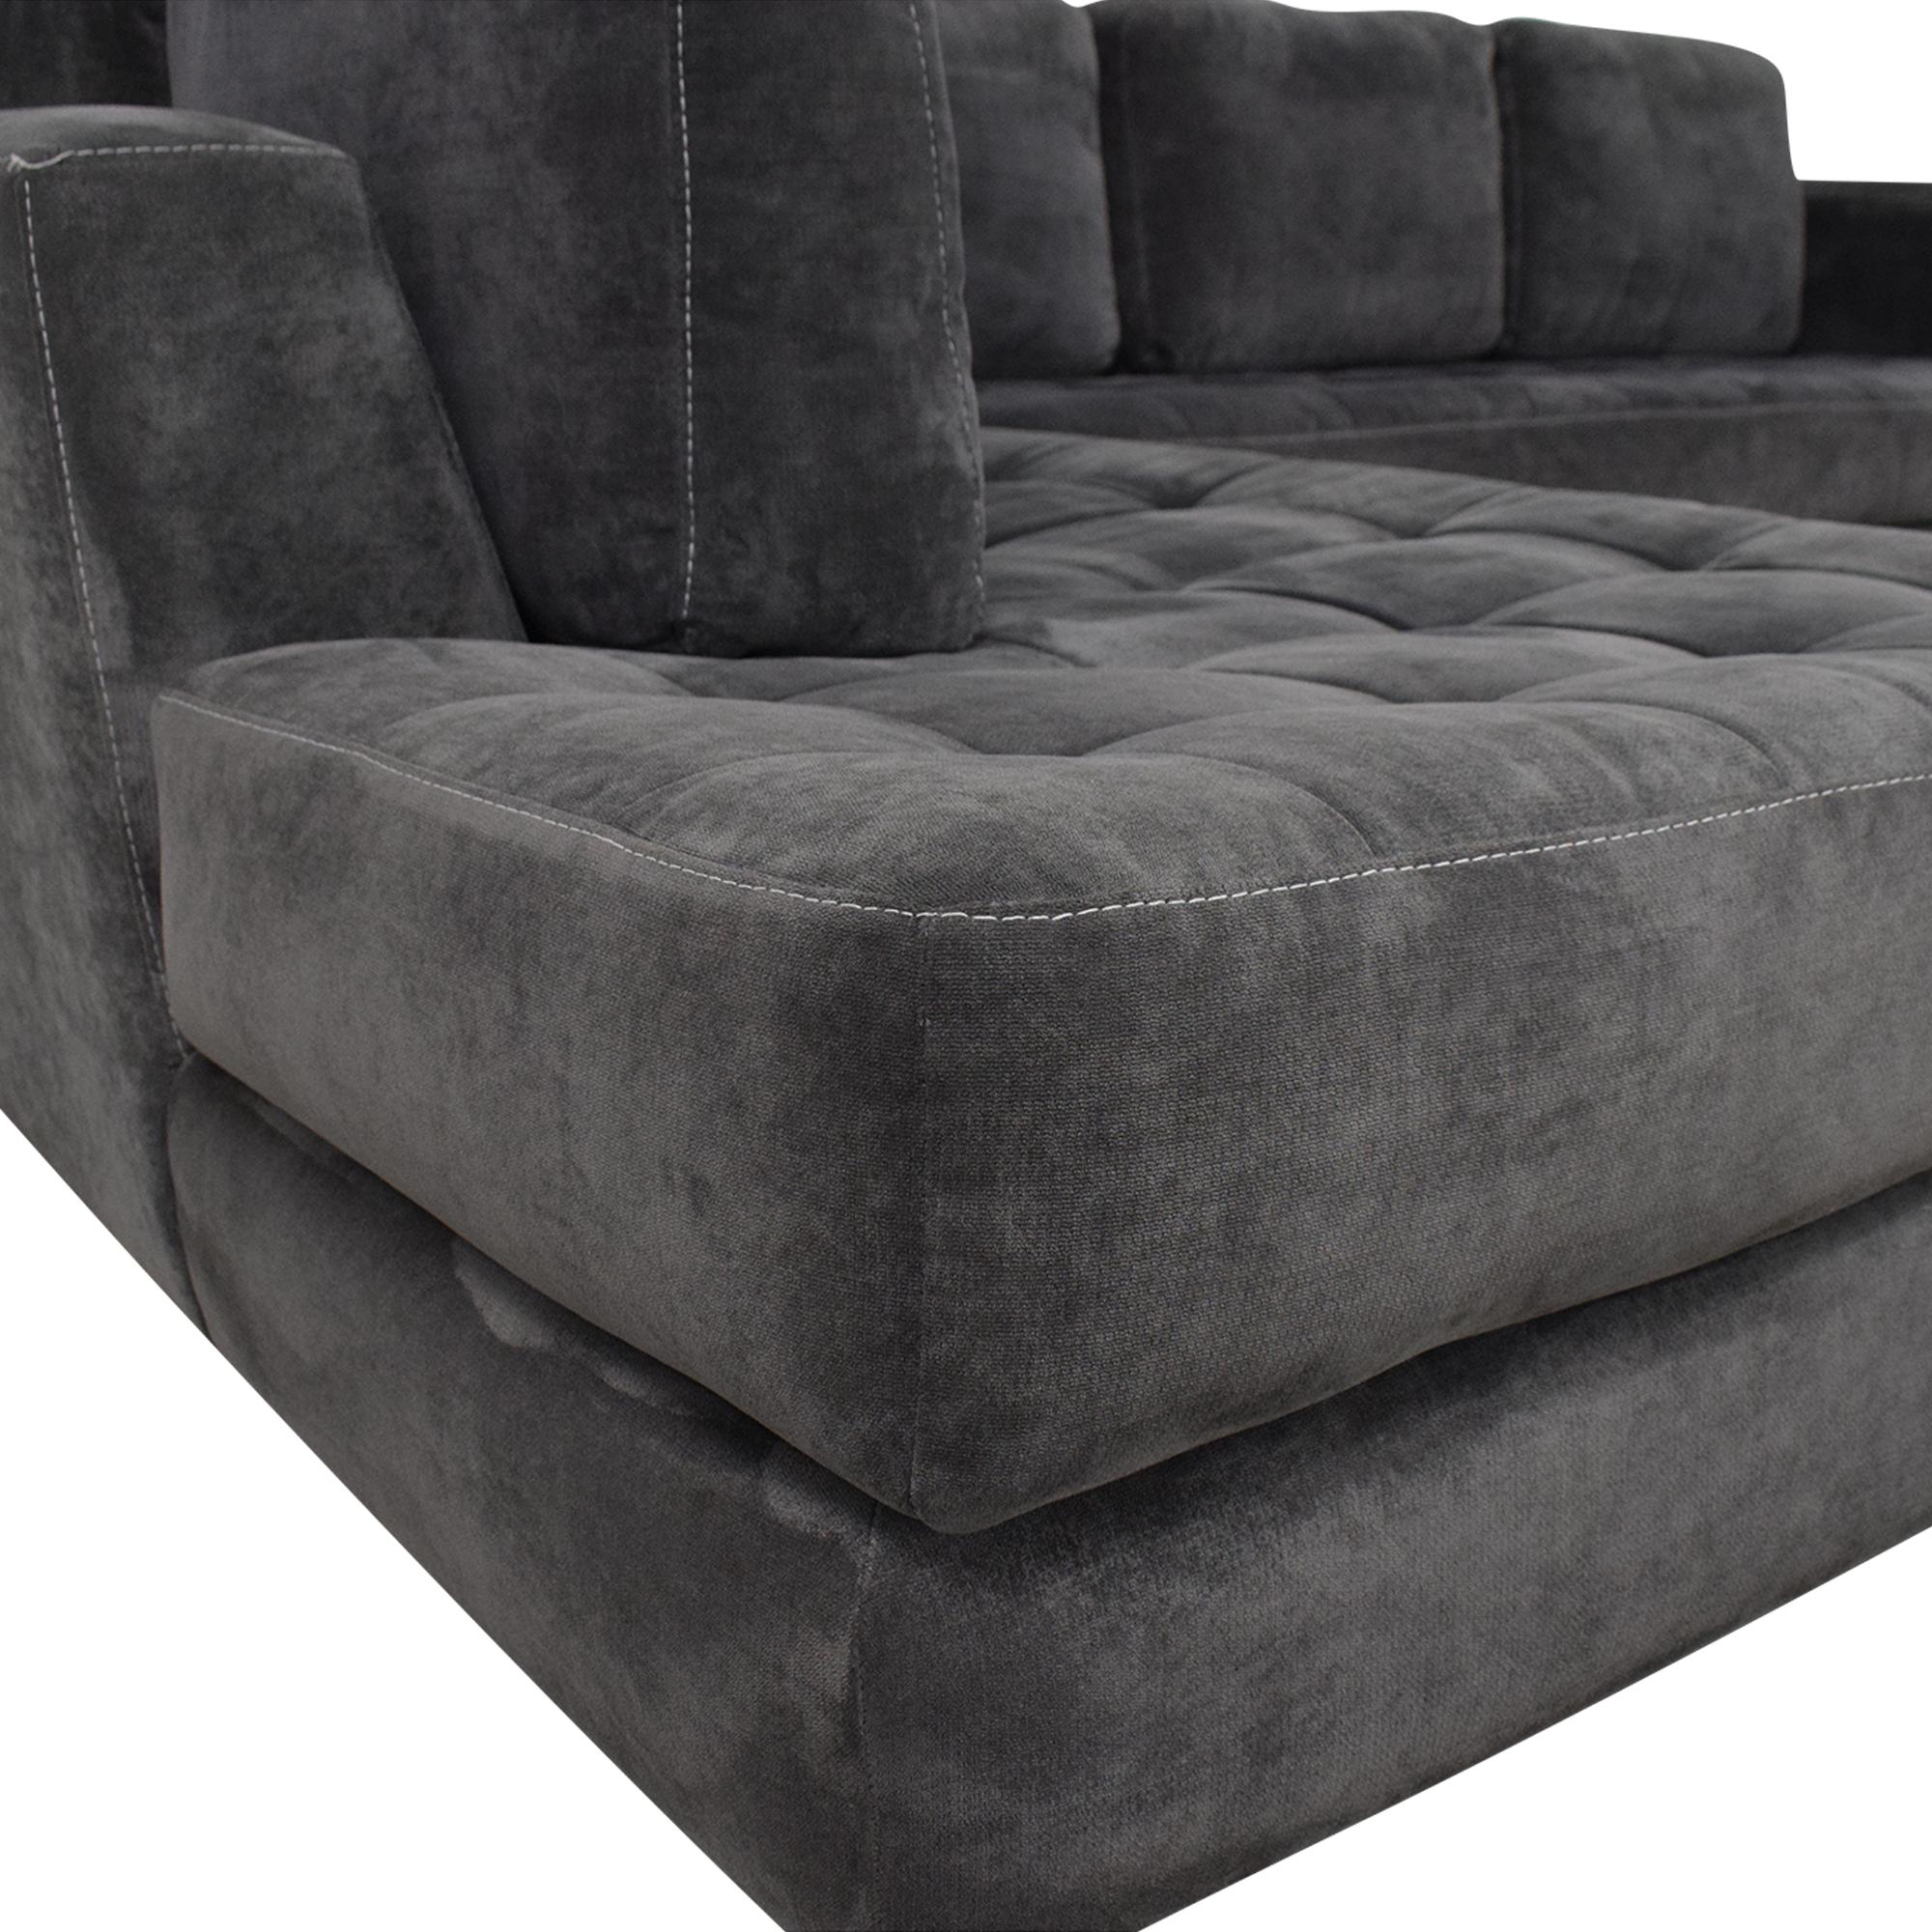 Macy's Macy's Milo Sectional Sofa nj